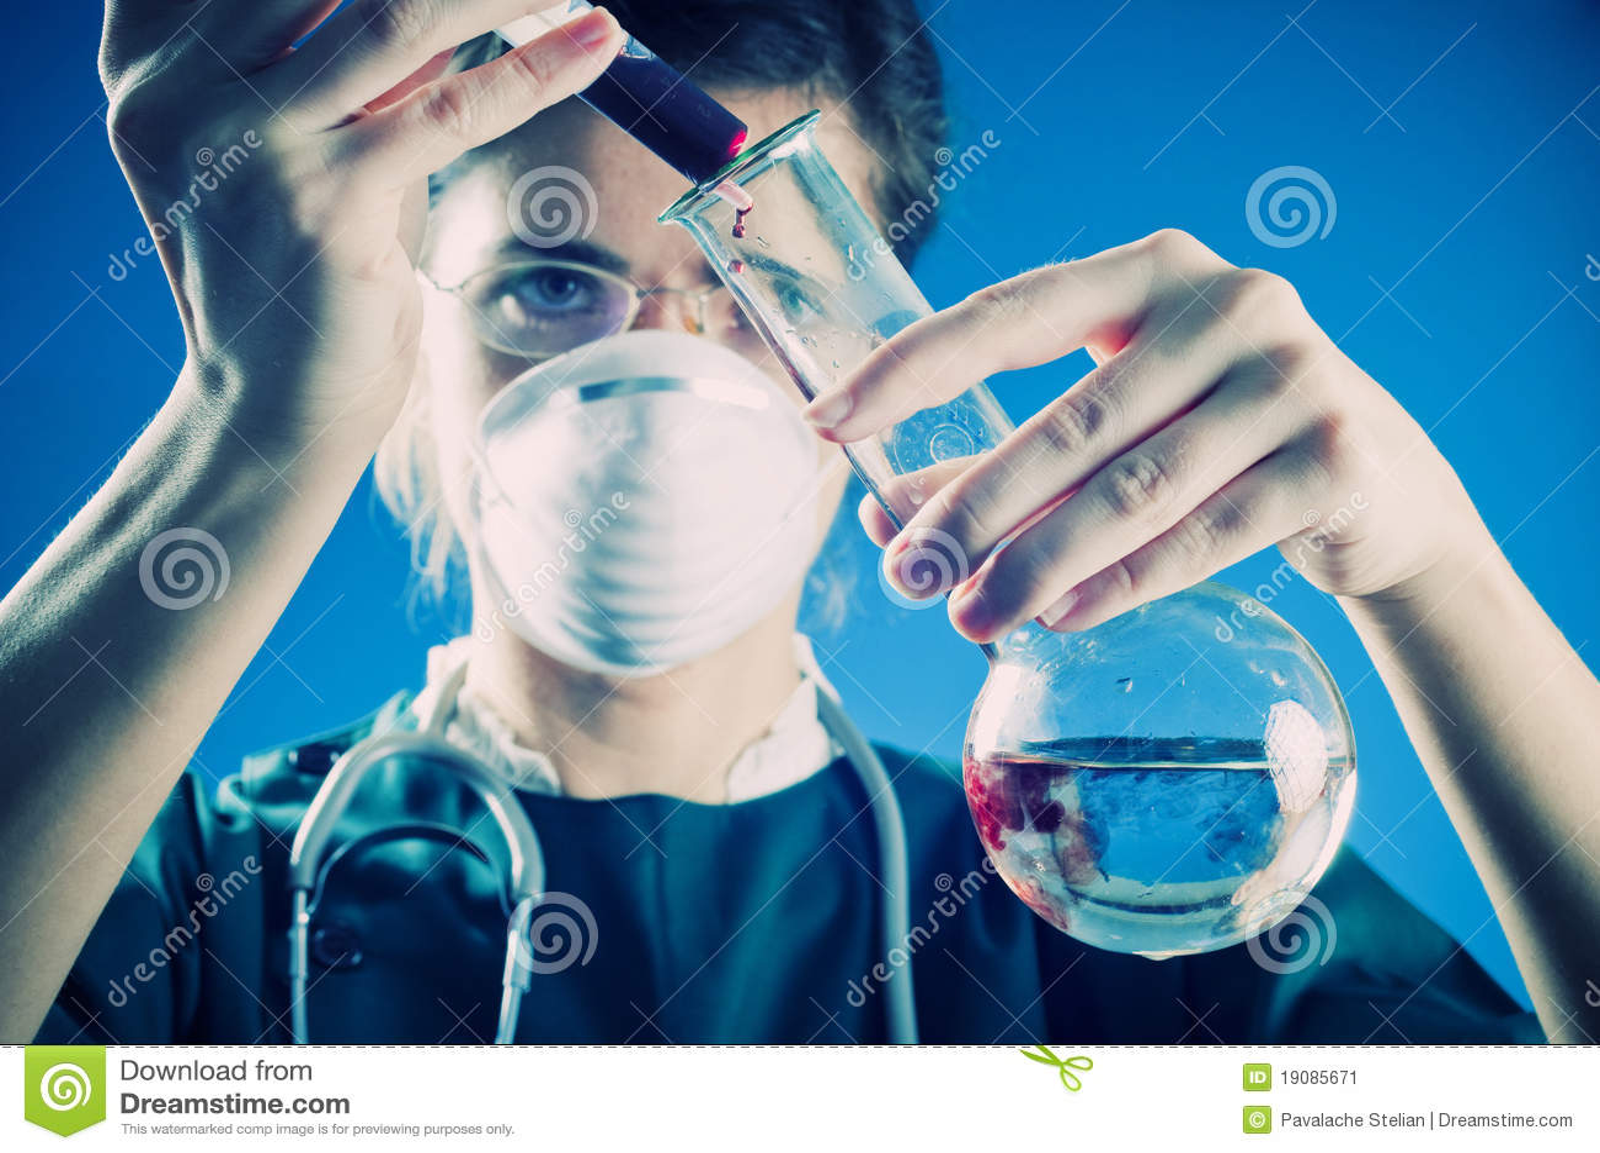 Medic in laboratory